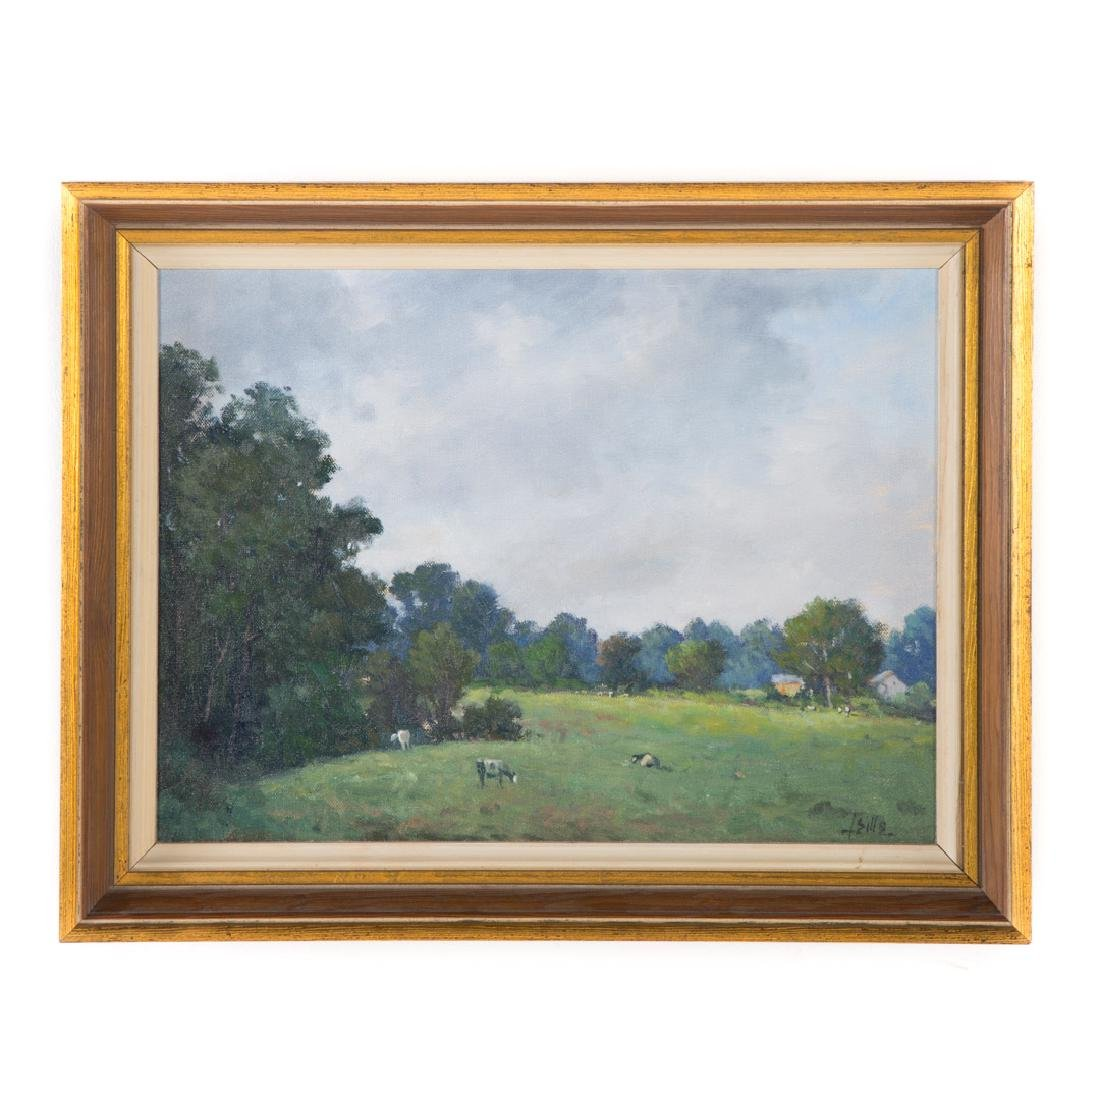 John Brandon Sills. Landscape with Cattle, oil